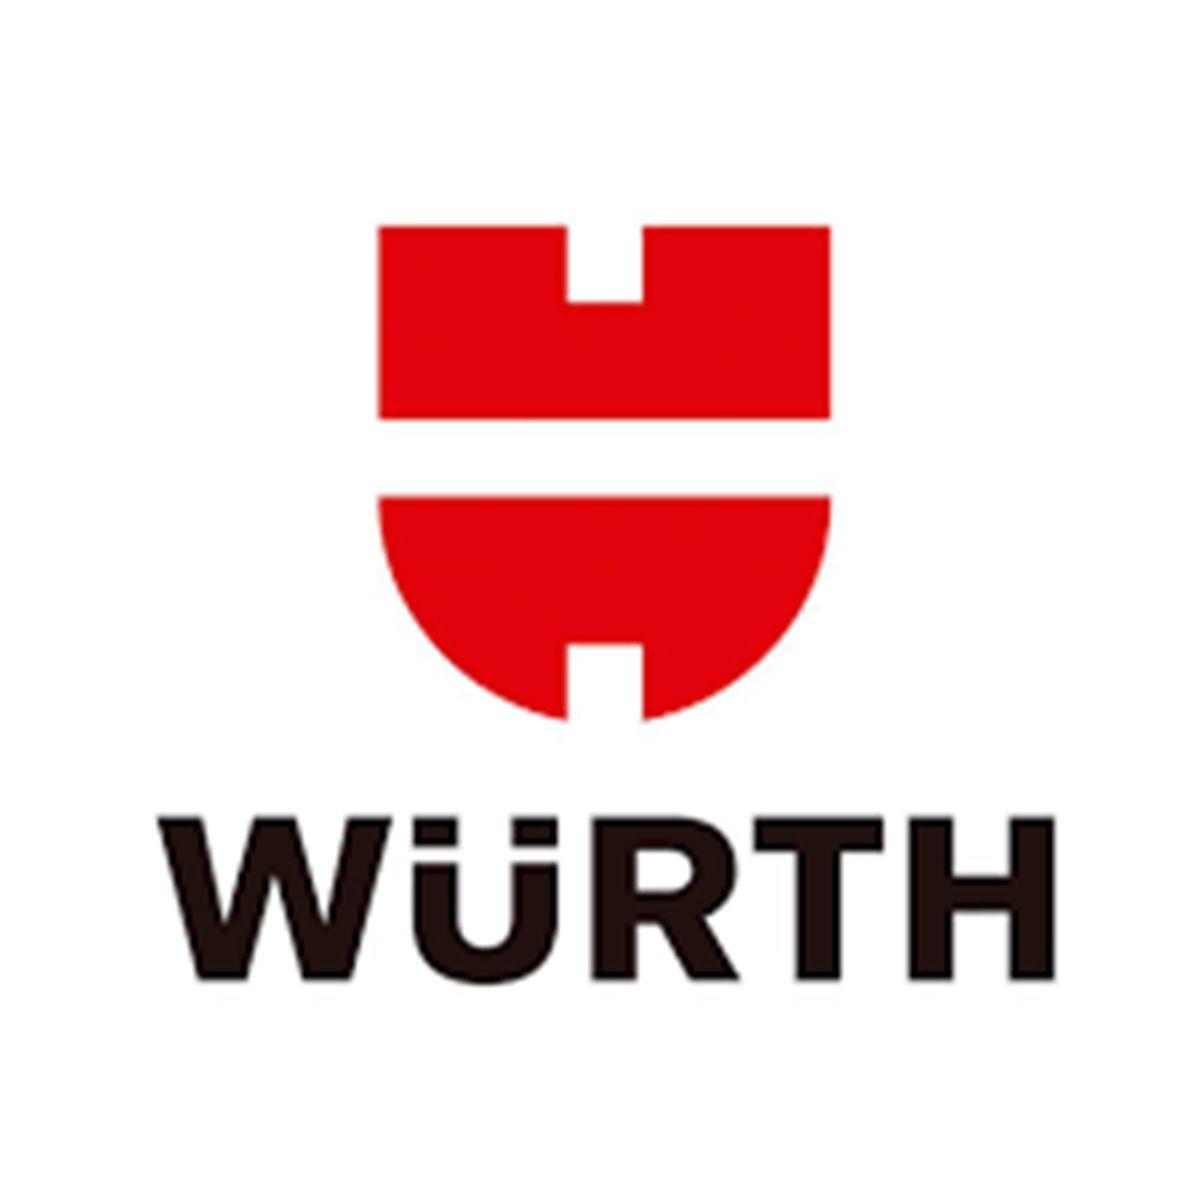 Conector RJ45 Wurth - Pacote com 100 unidades